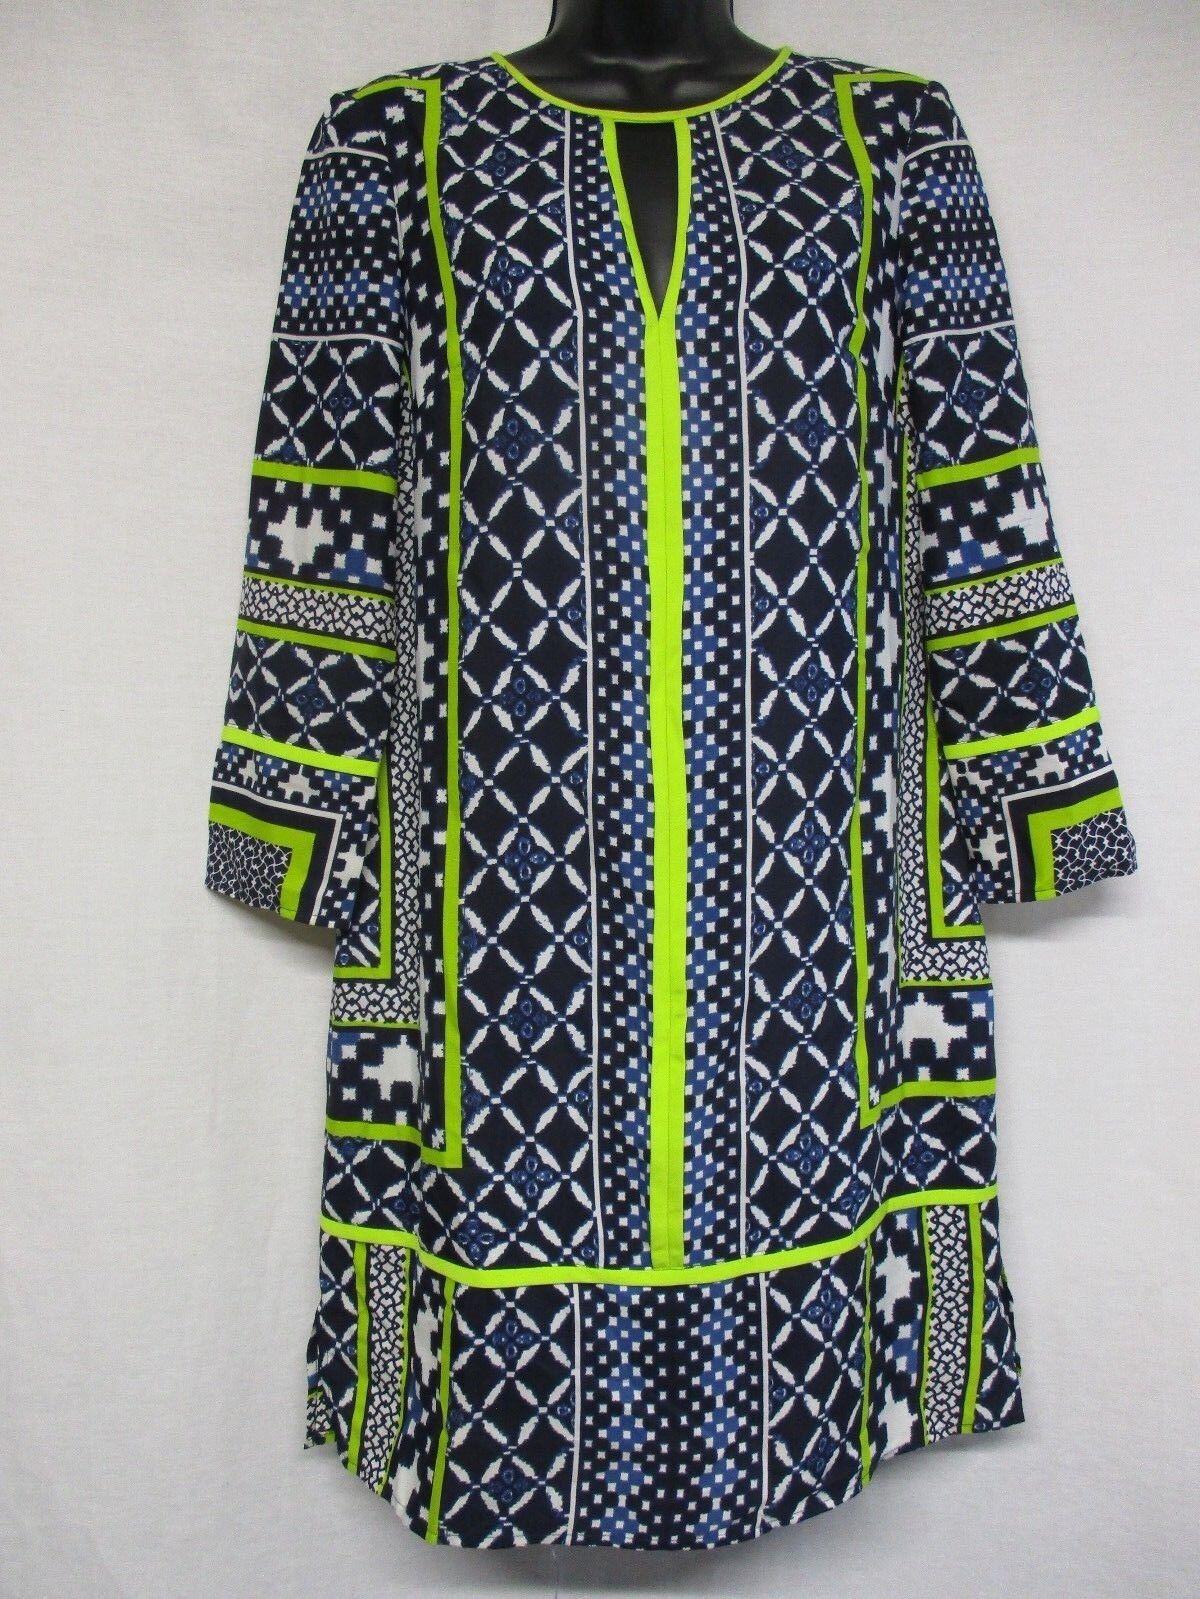 Vince Camuto Women's Printed  Keyhole Shift Dress Size 6        g2